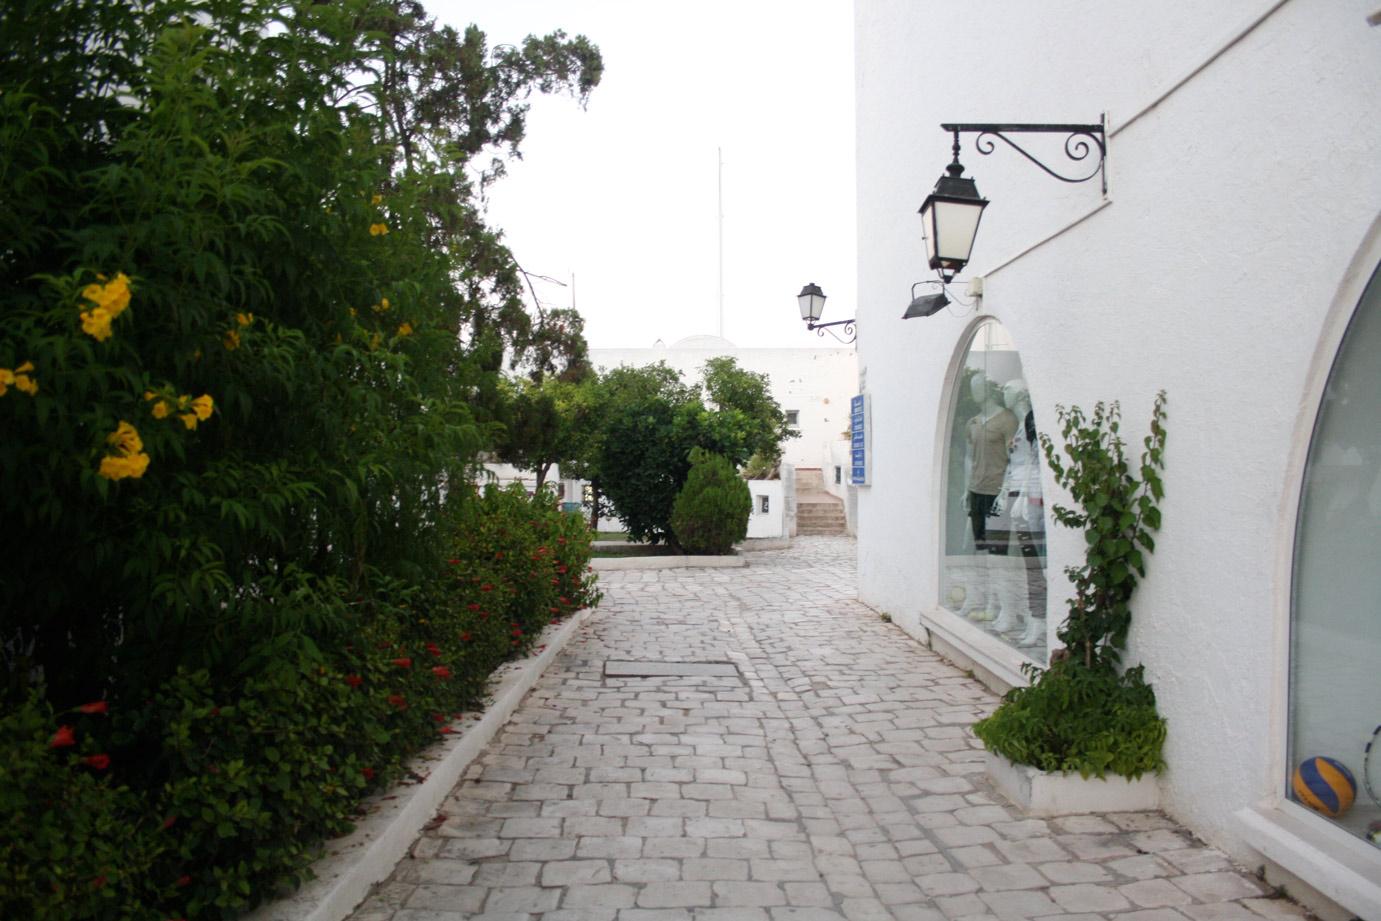 TUNISIA PHOTO DIARY III. 7